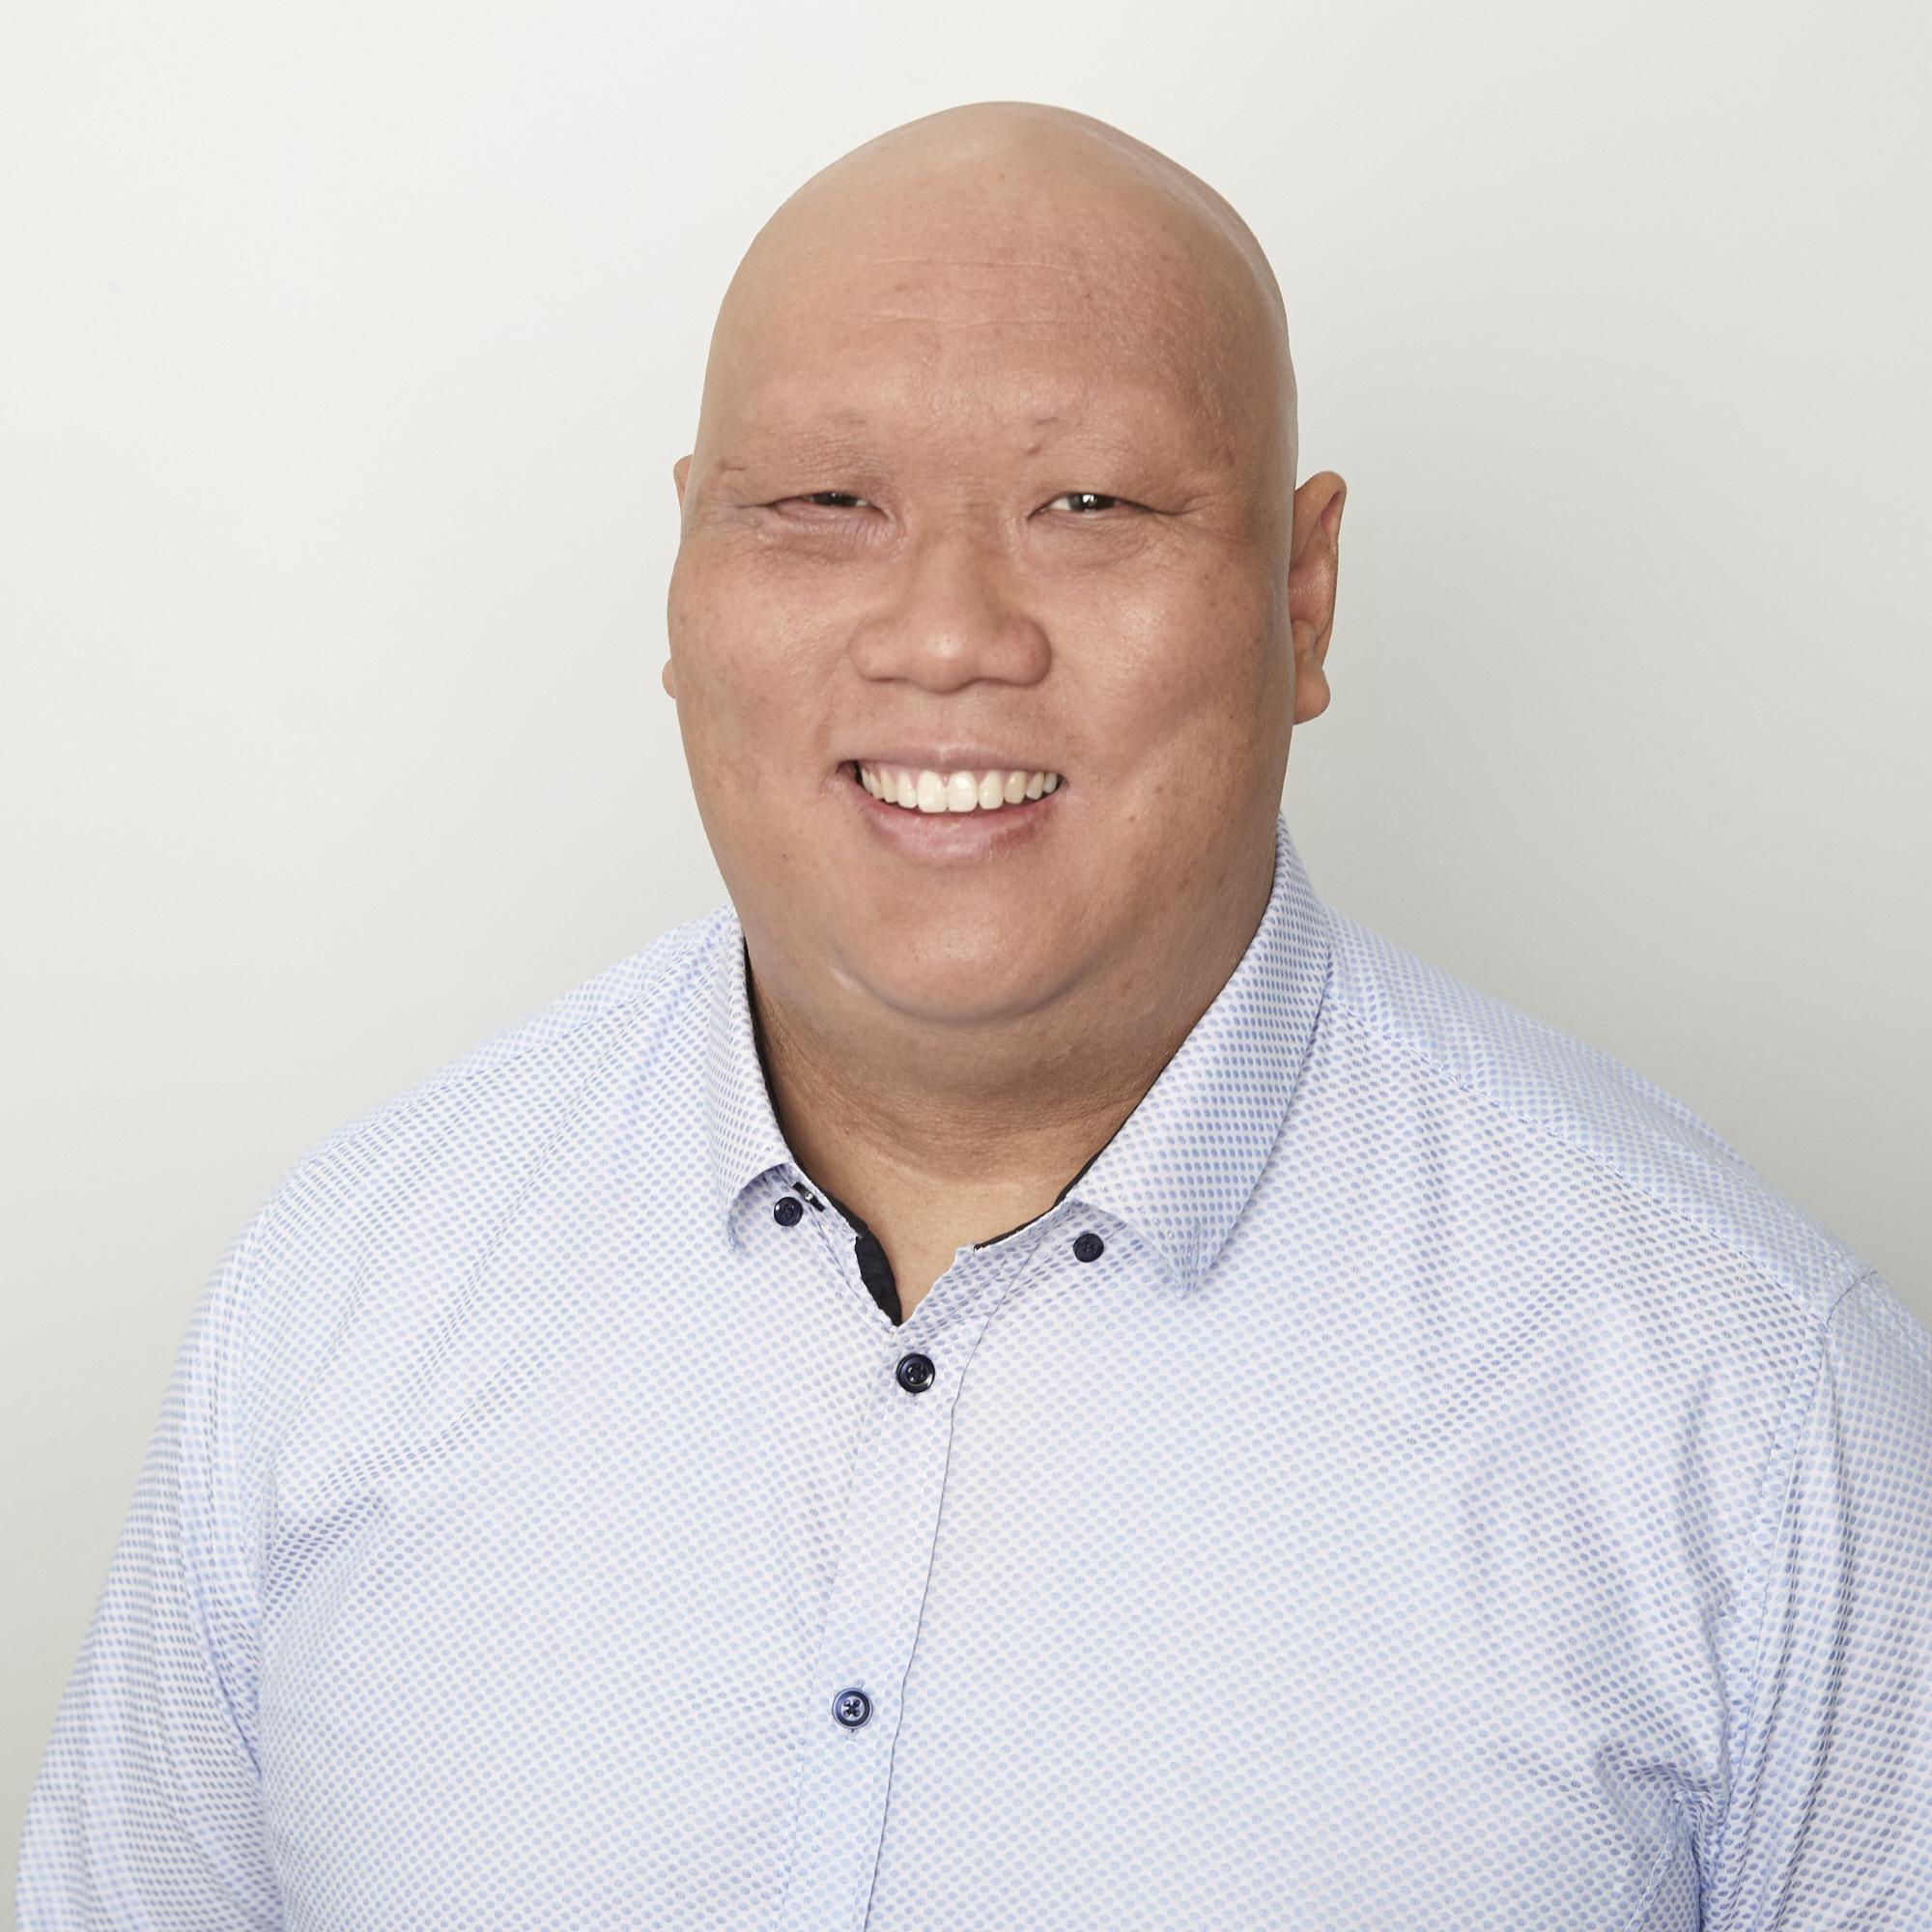 Headshot of Antony Lo, The Physio Detective